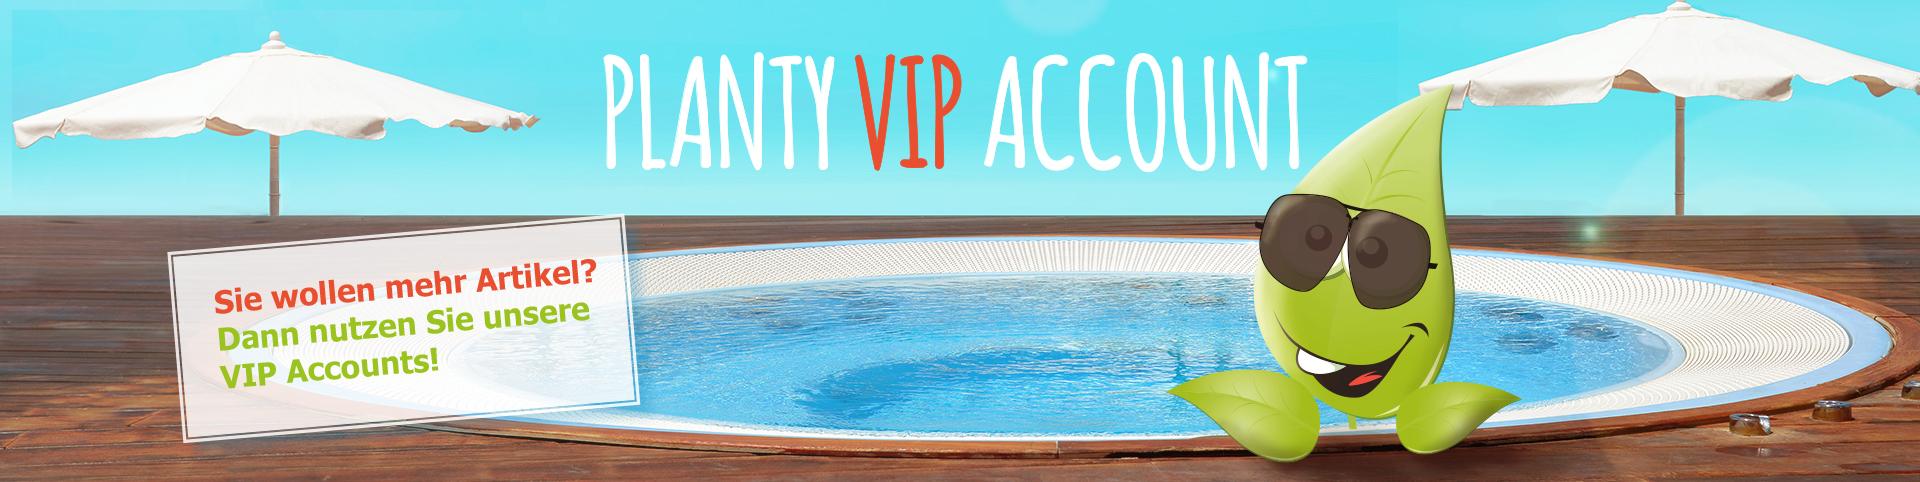 Planty VIP